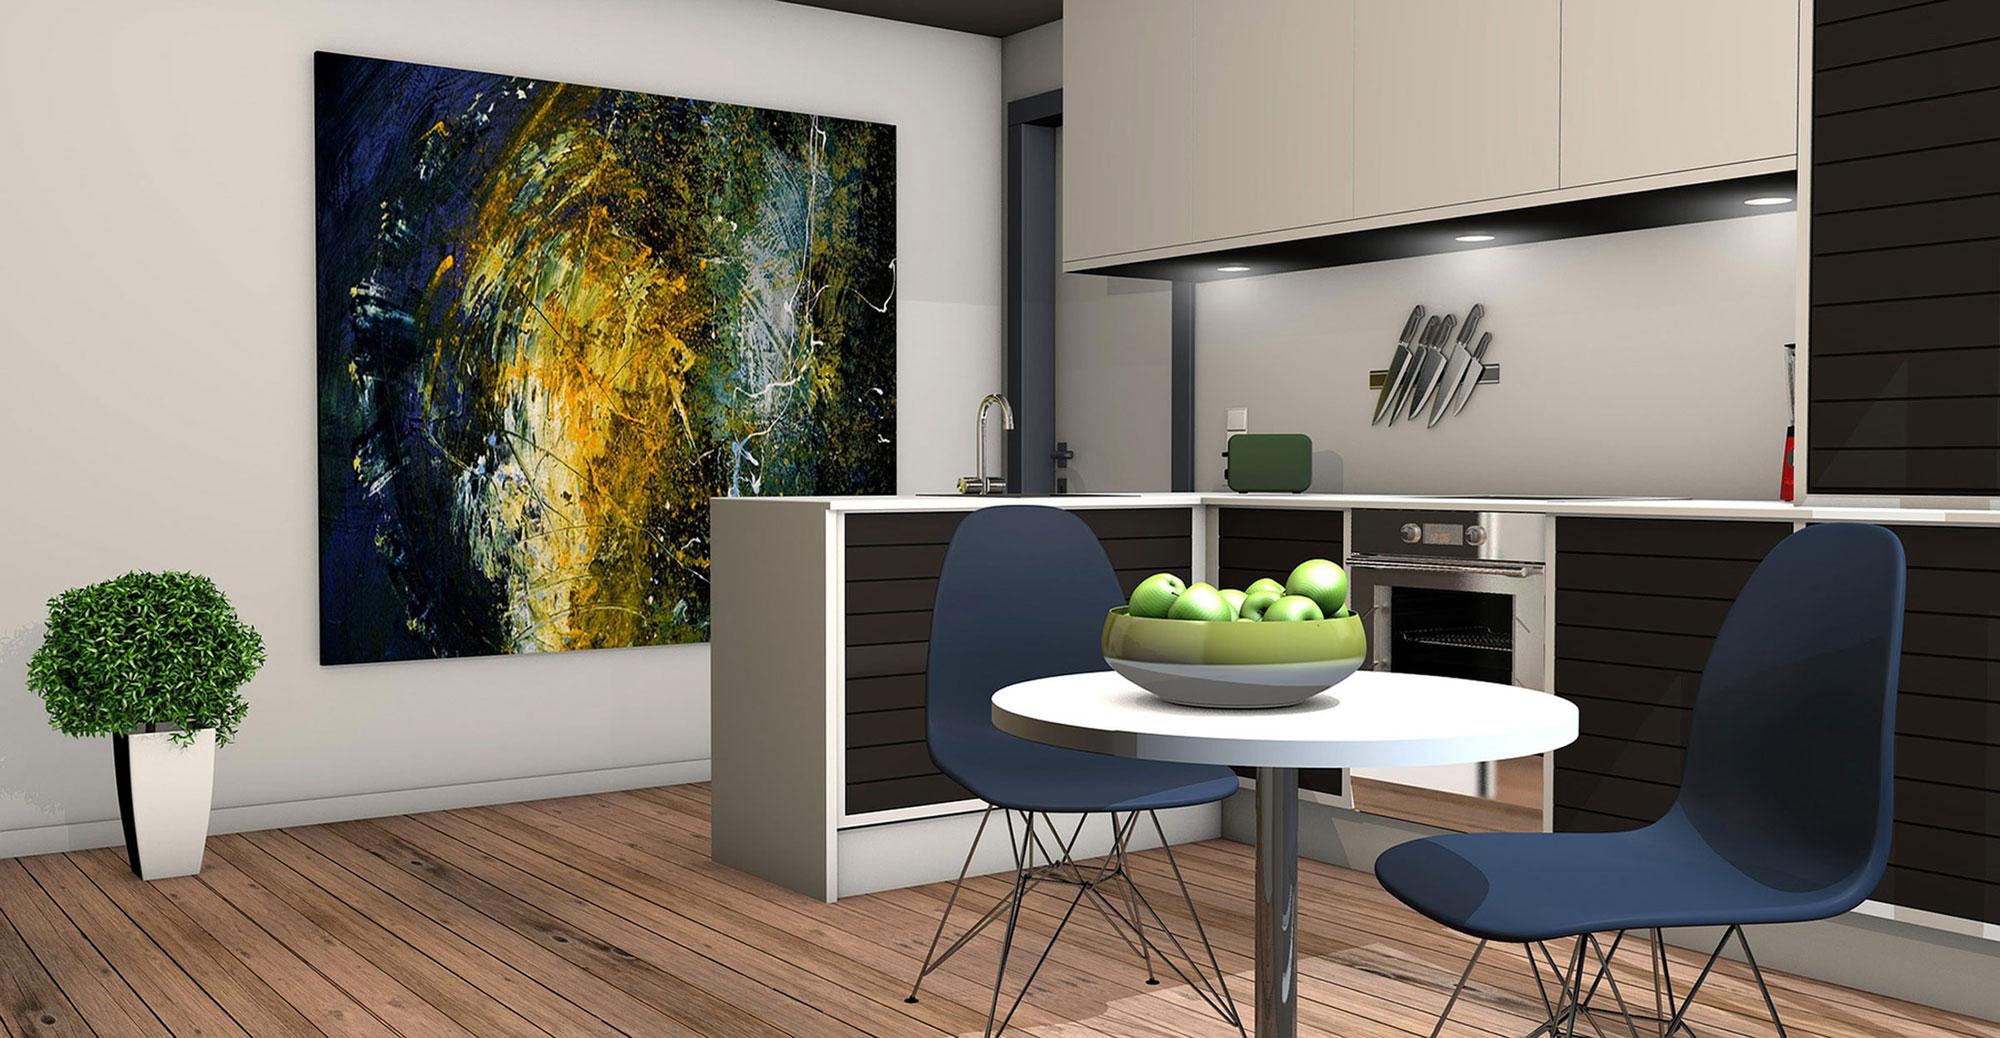 architectuur-interieur-ontwerp-vb2a